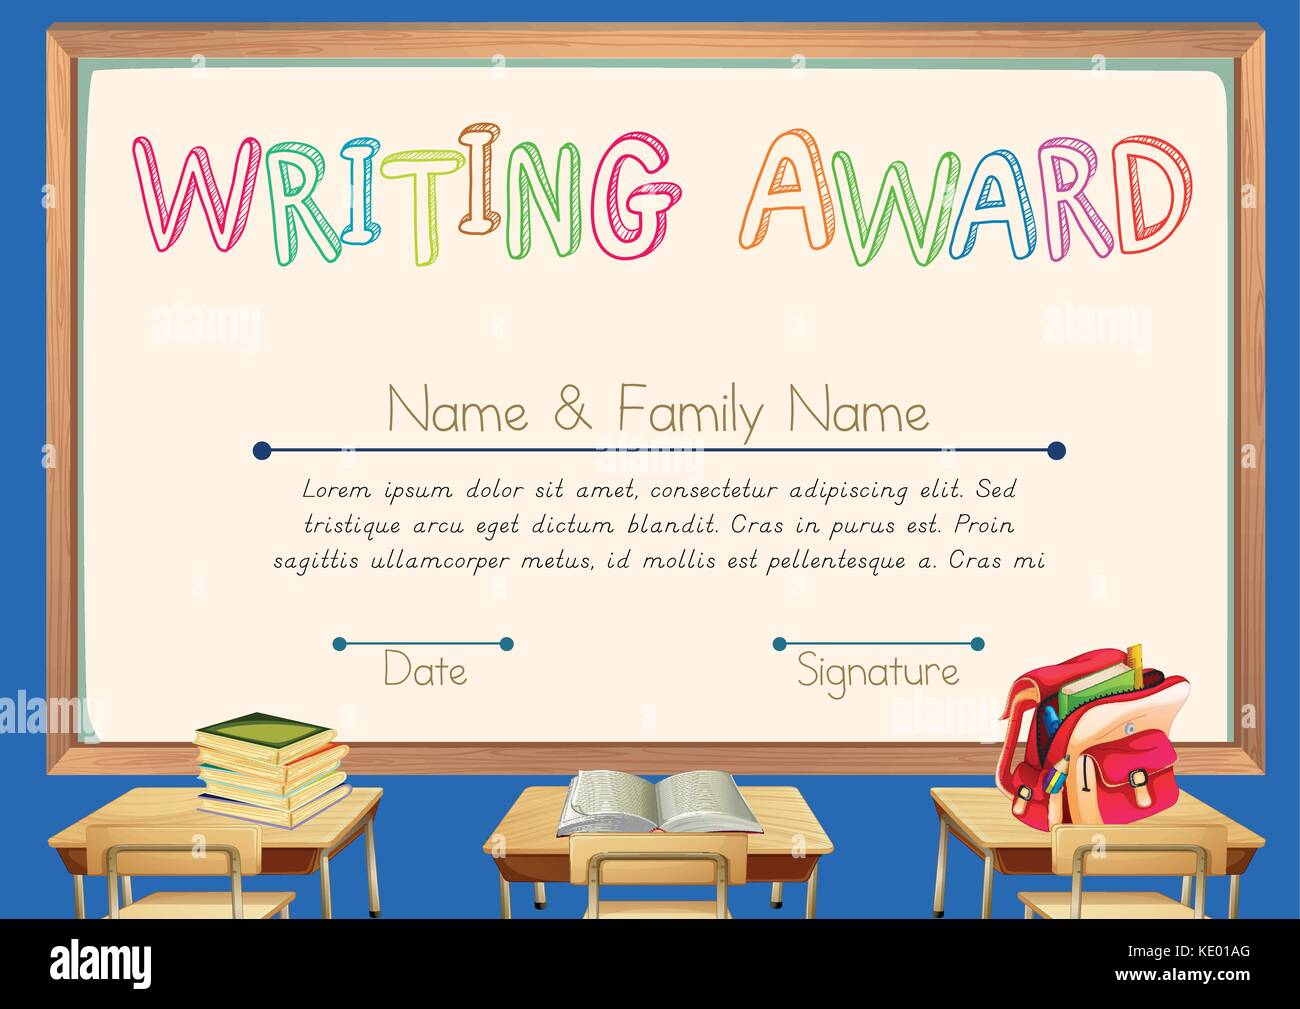 Lancaster Writing Award